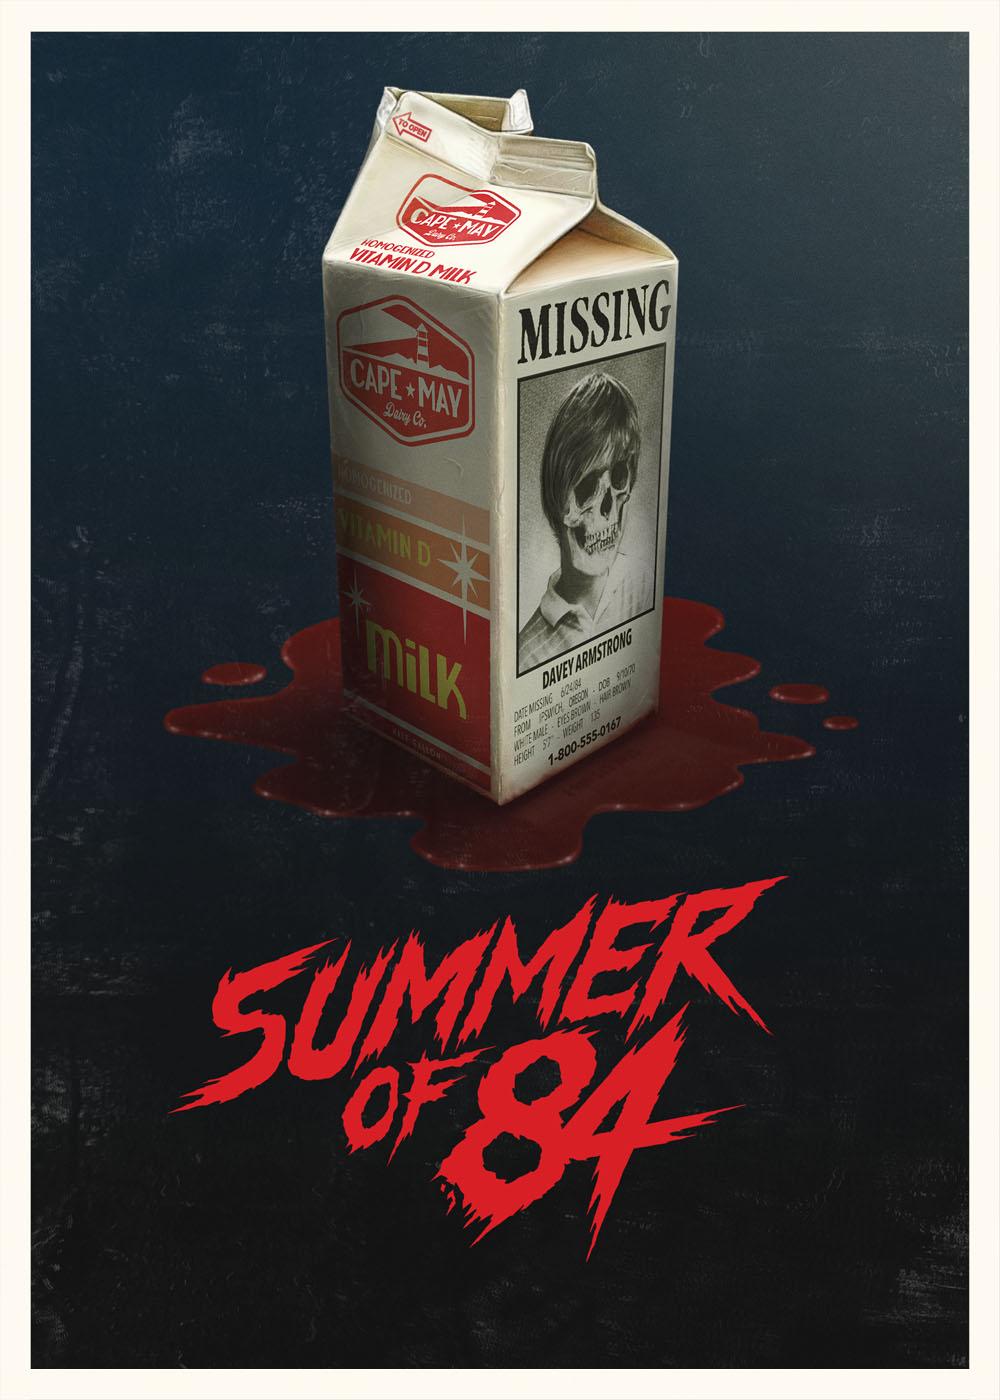 summerof84_poster.jpg